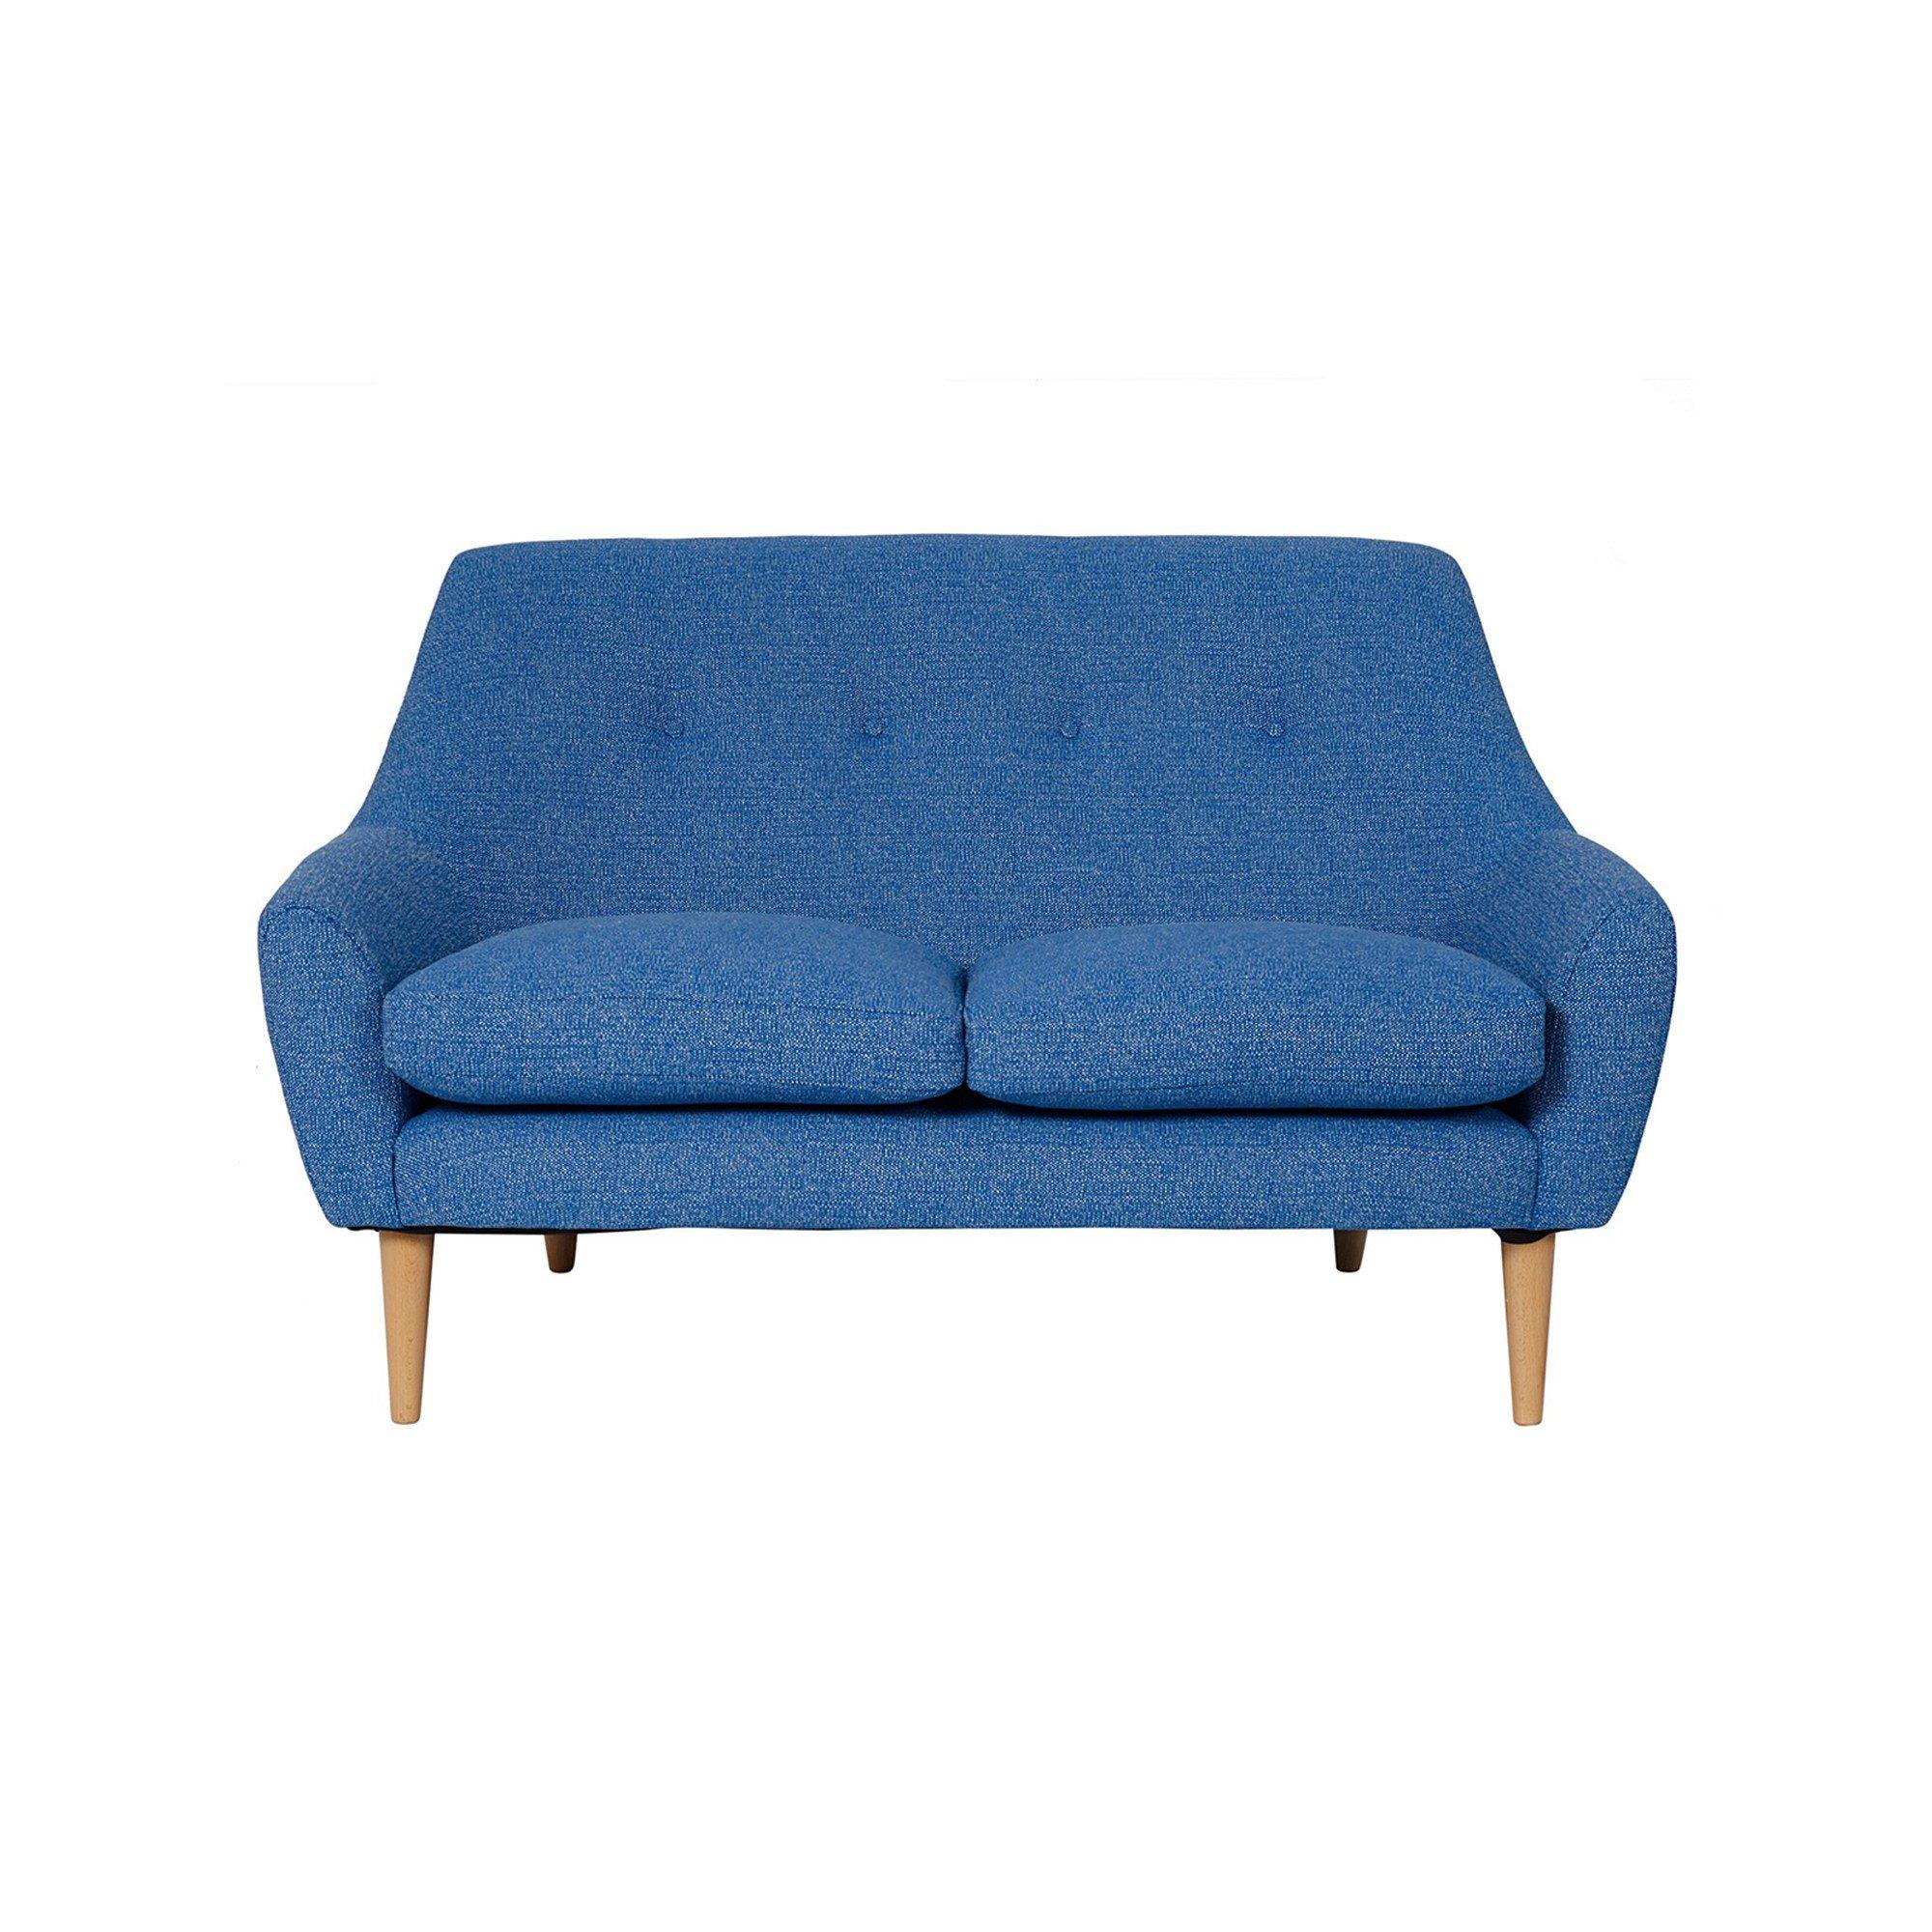 Astonishing Small Sofas Slim 2 Seater Settee Loveseat Snuggler Sofa Wide Interior Design Ideas Clesiryabchikinfo